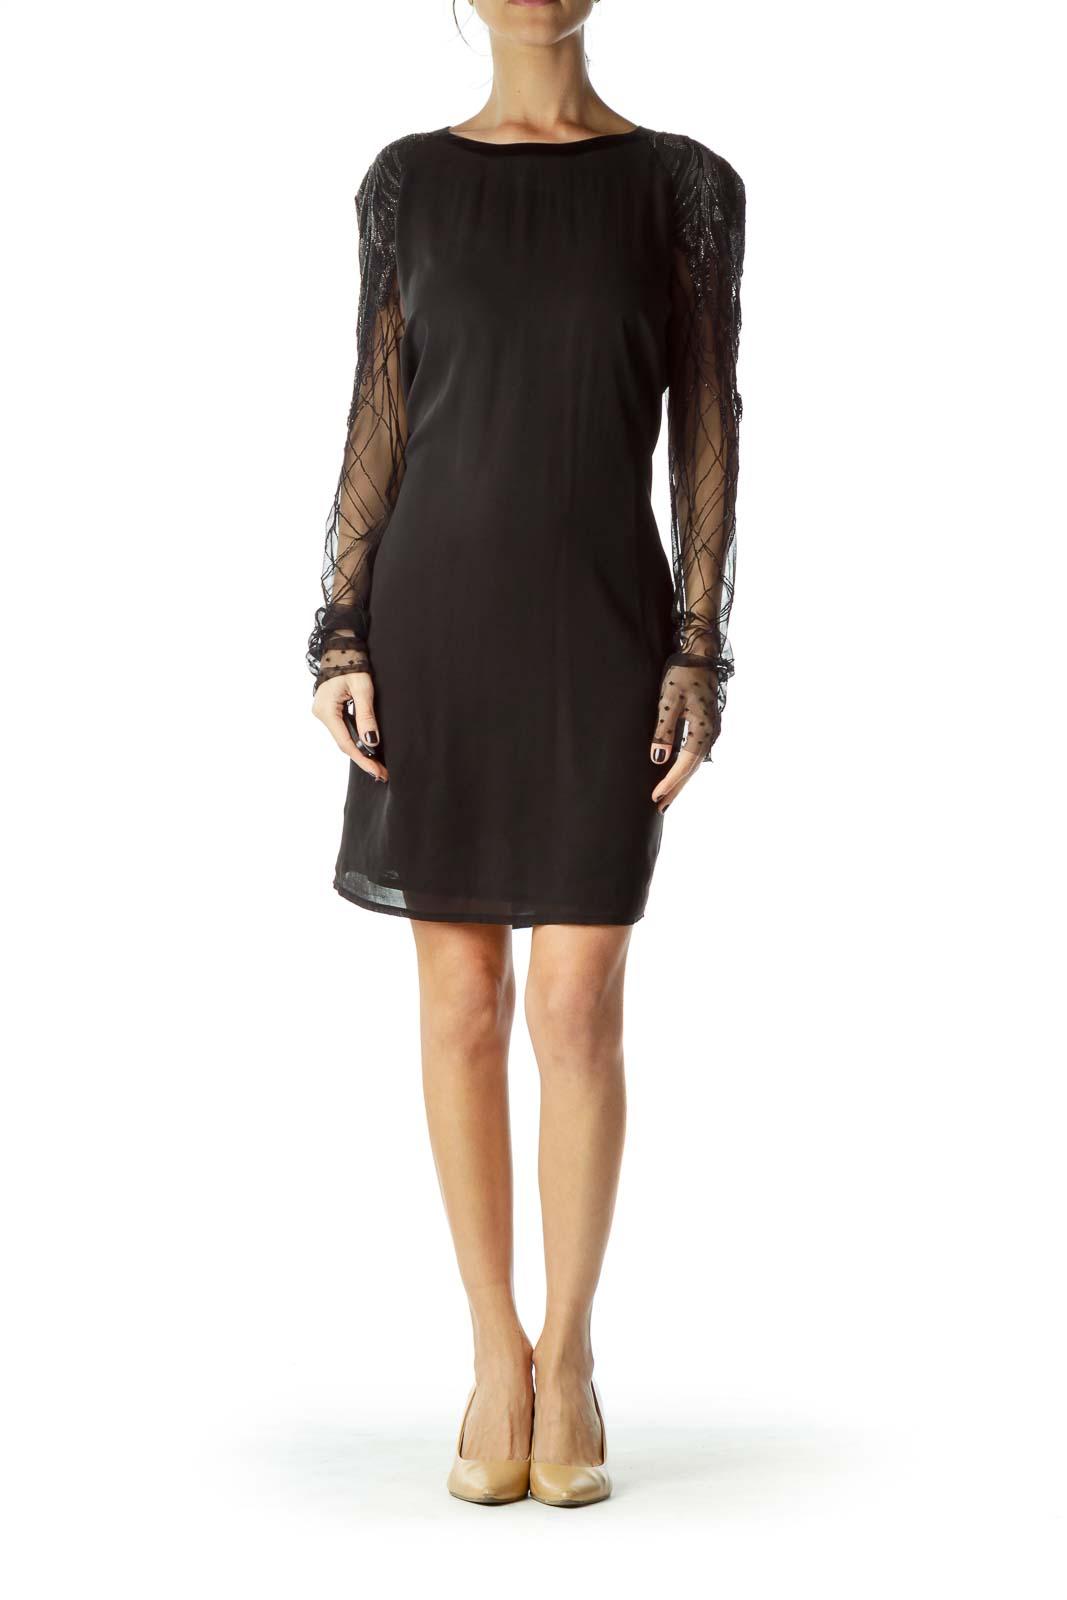 f184720256 Shop Jasmine di Milo clothing and handbags at SilkRoll. Trade with us!